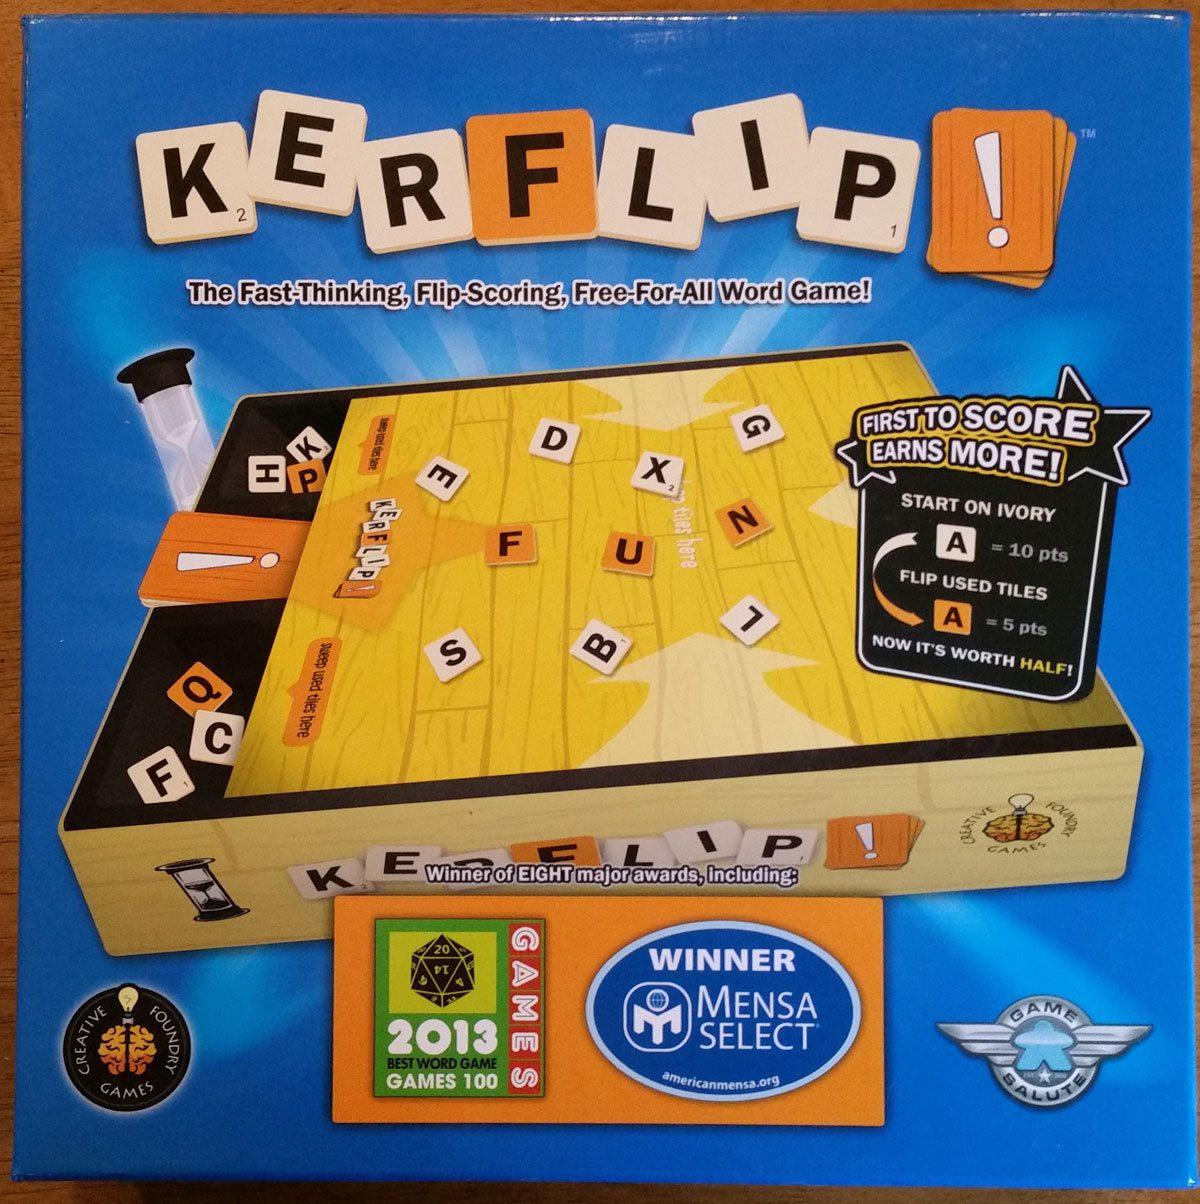 Kerflip! Image by Rob Huddleston